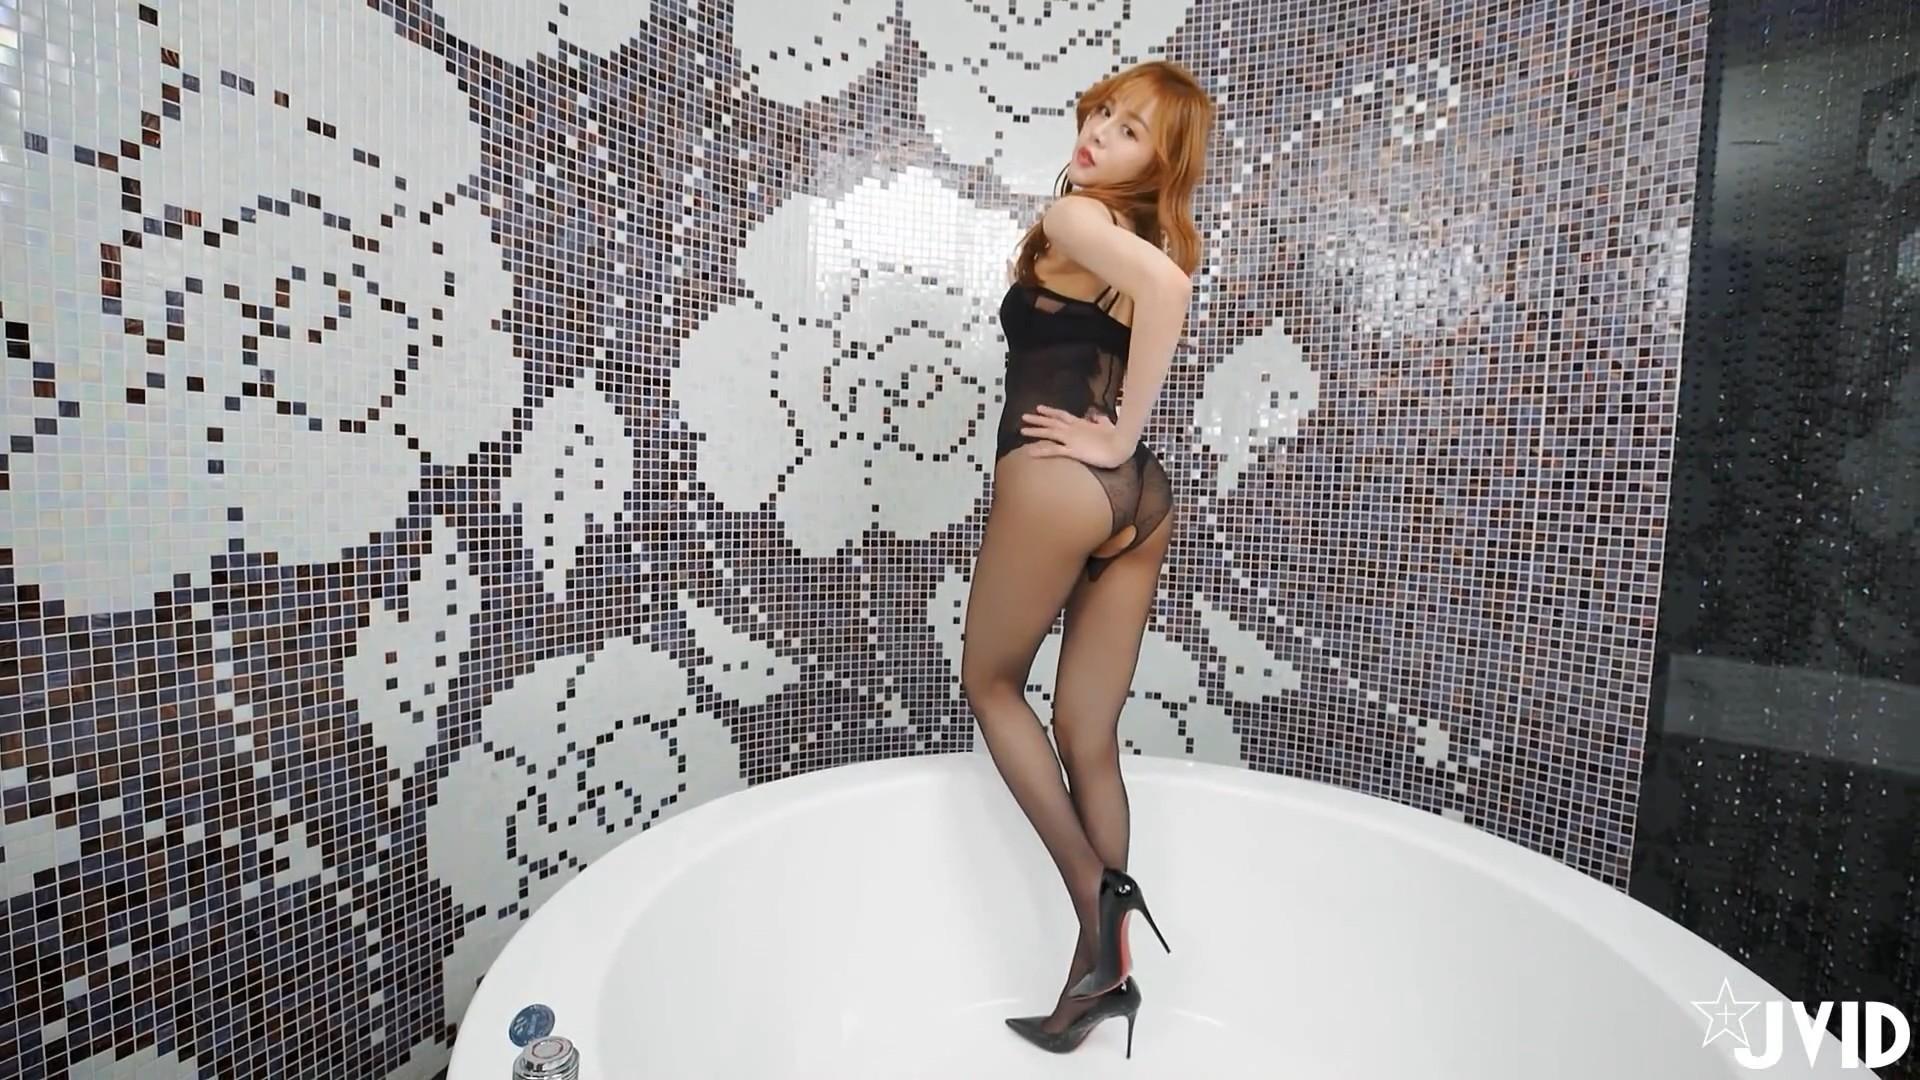 [JVID视频] 長腿娃娃Lena 莉娜身材太惹火[1V/316M]